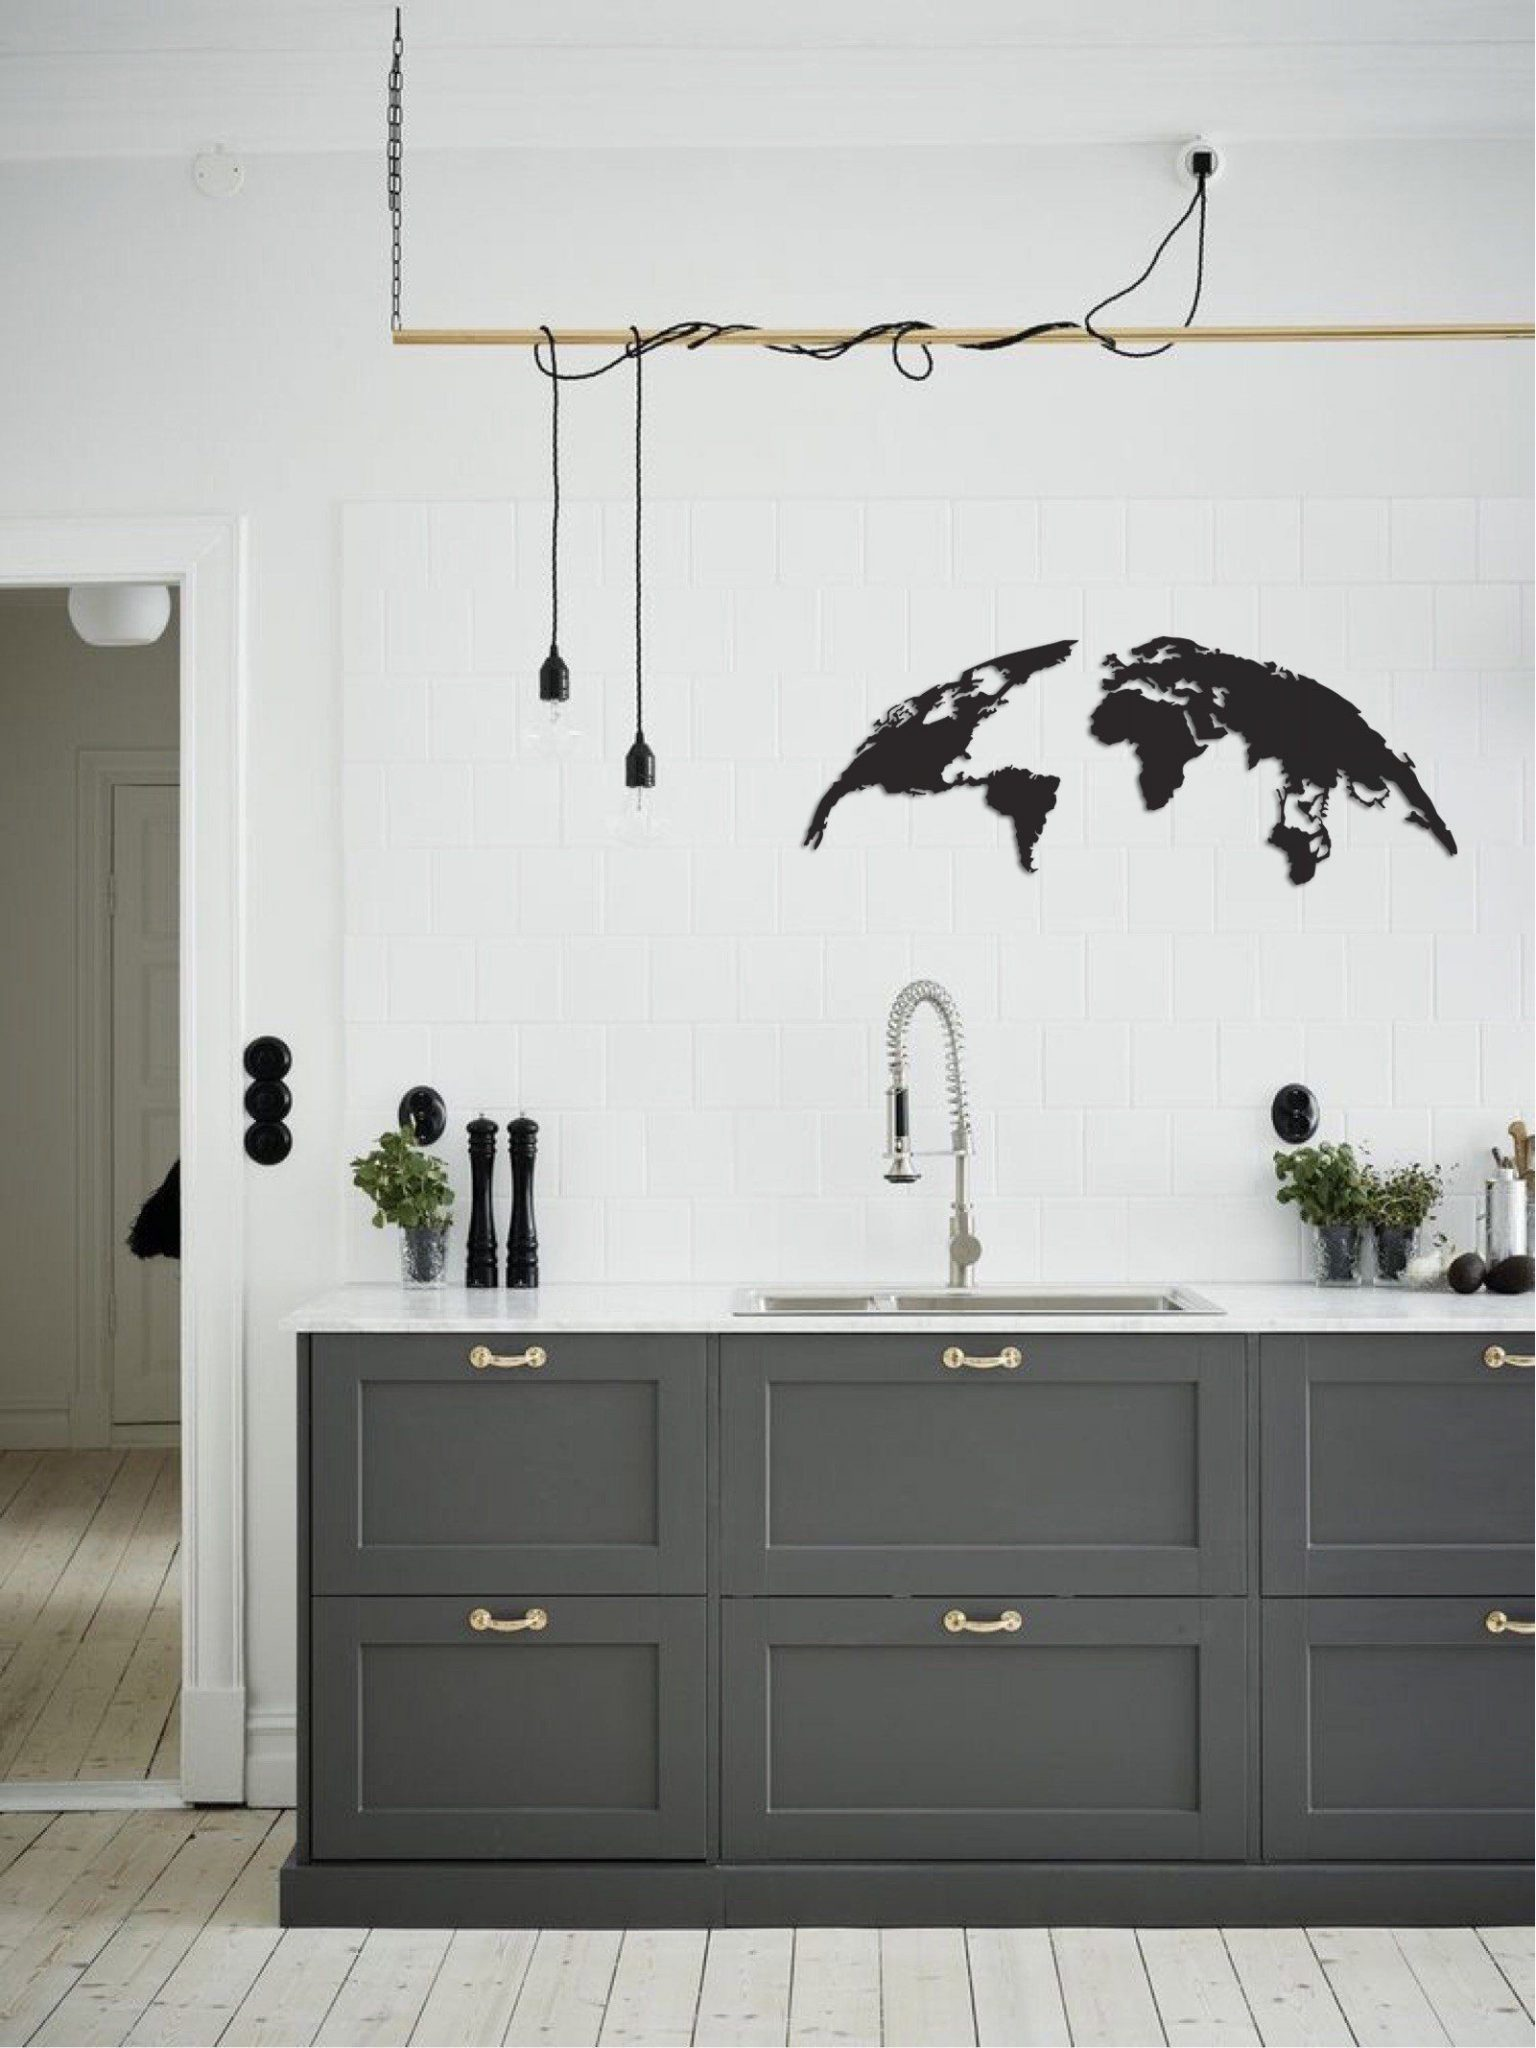 b&q kitchen lighting ideas